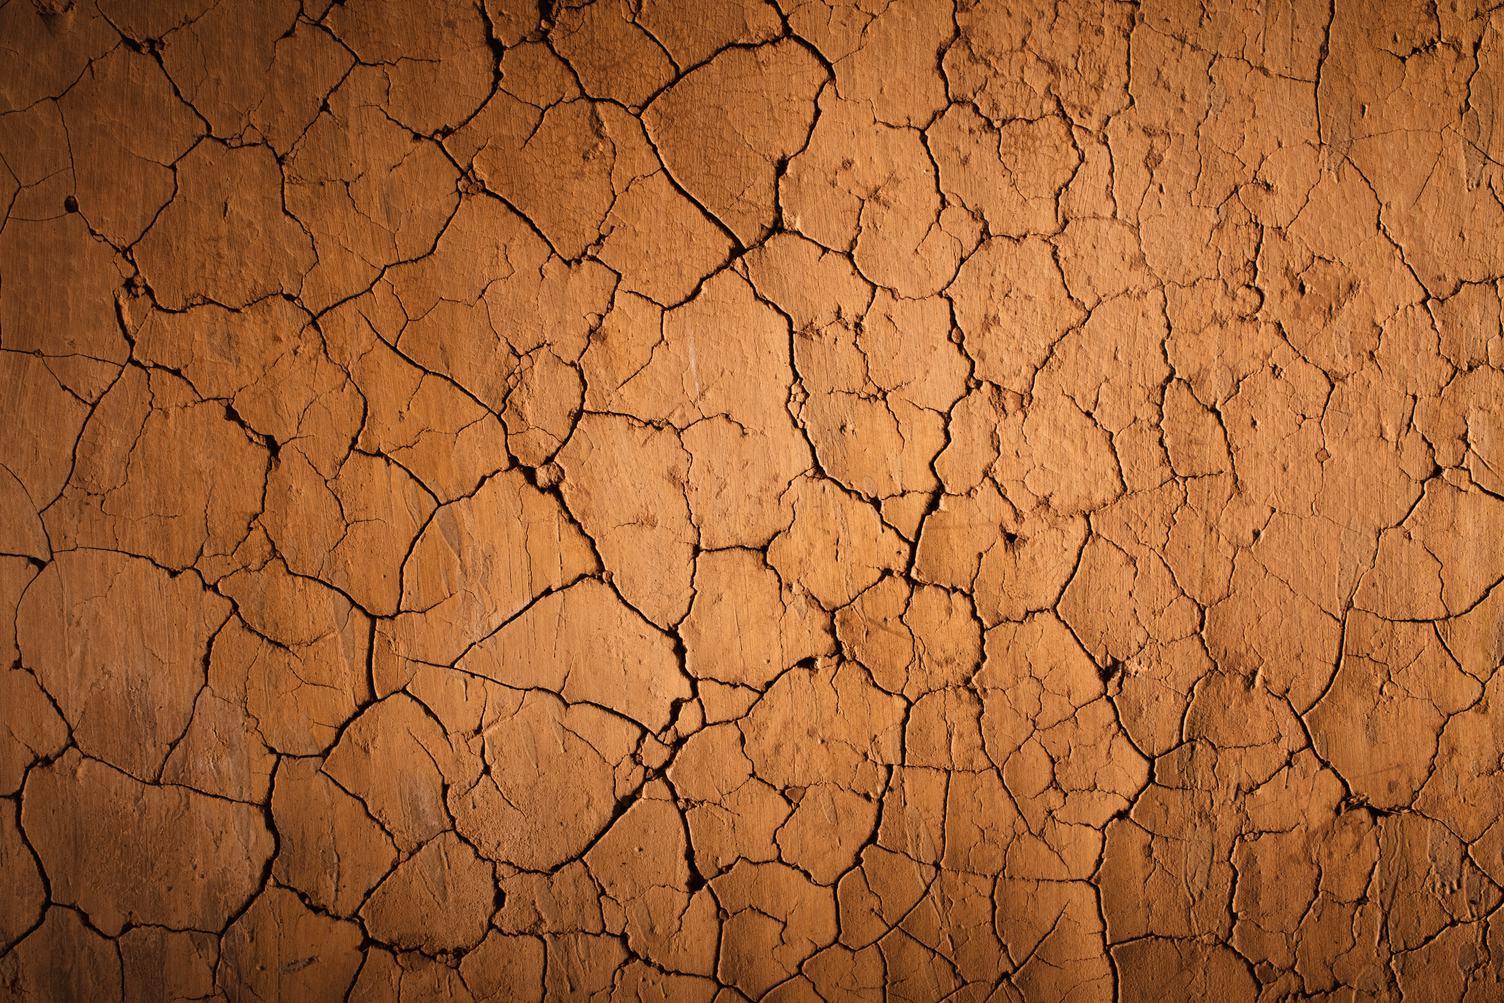 Cracks of the Dried Soil in Arid Season